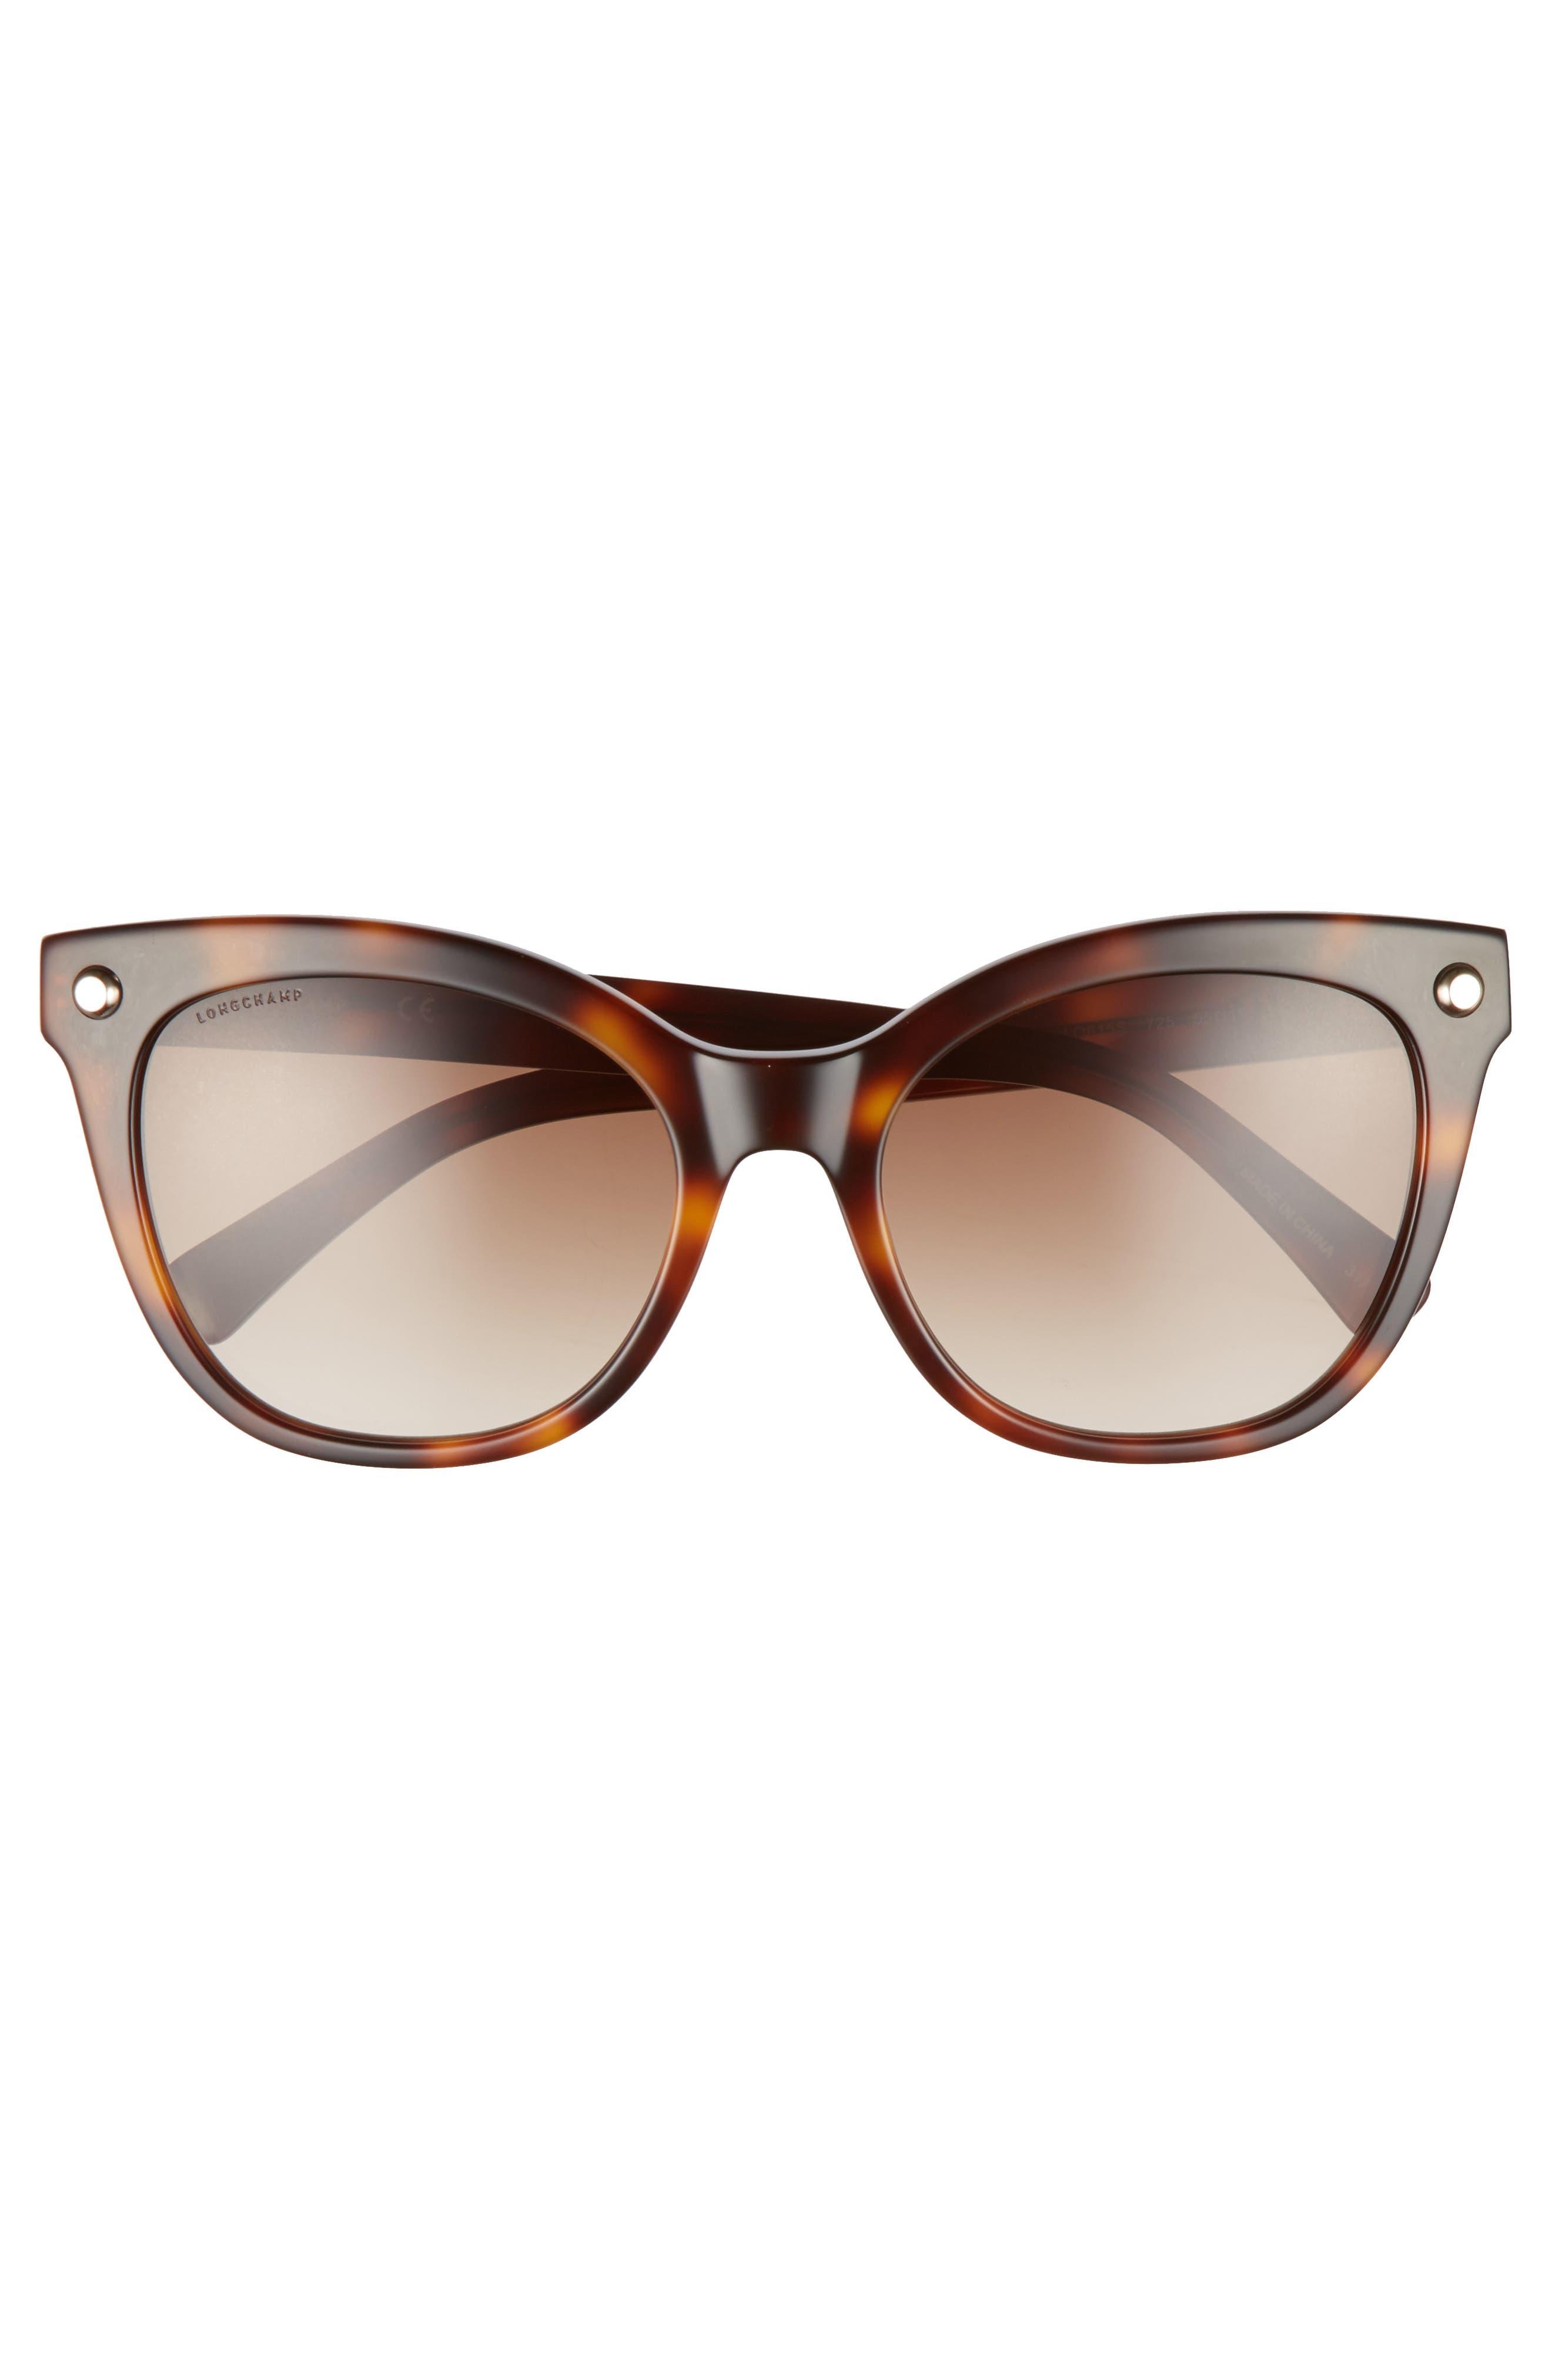 55mm Cat Eye Sunglasses,                             Alternate thumbnail 3, color,                             Blonde Havana